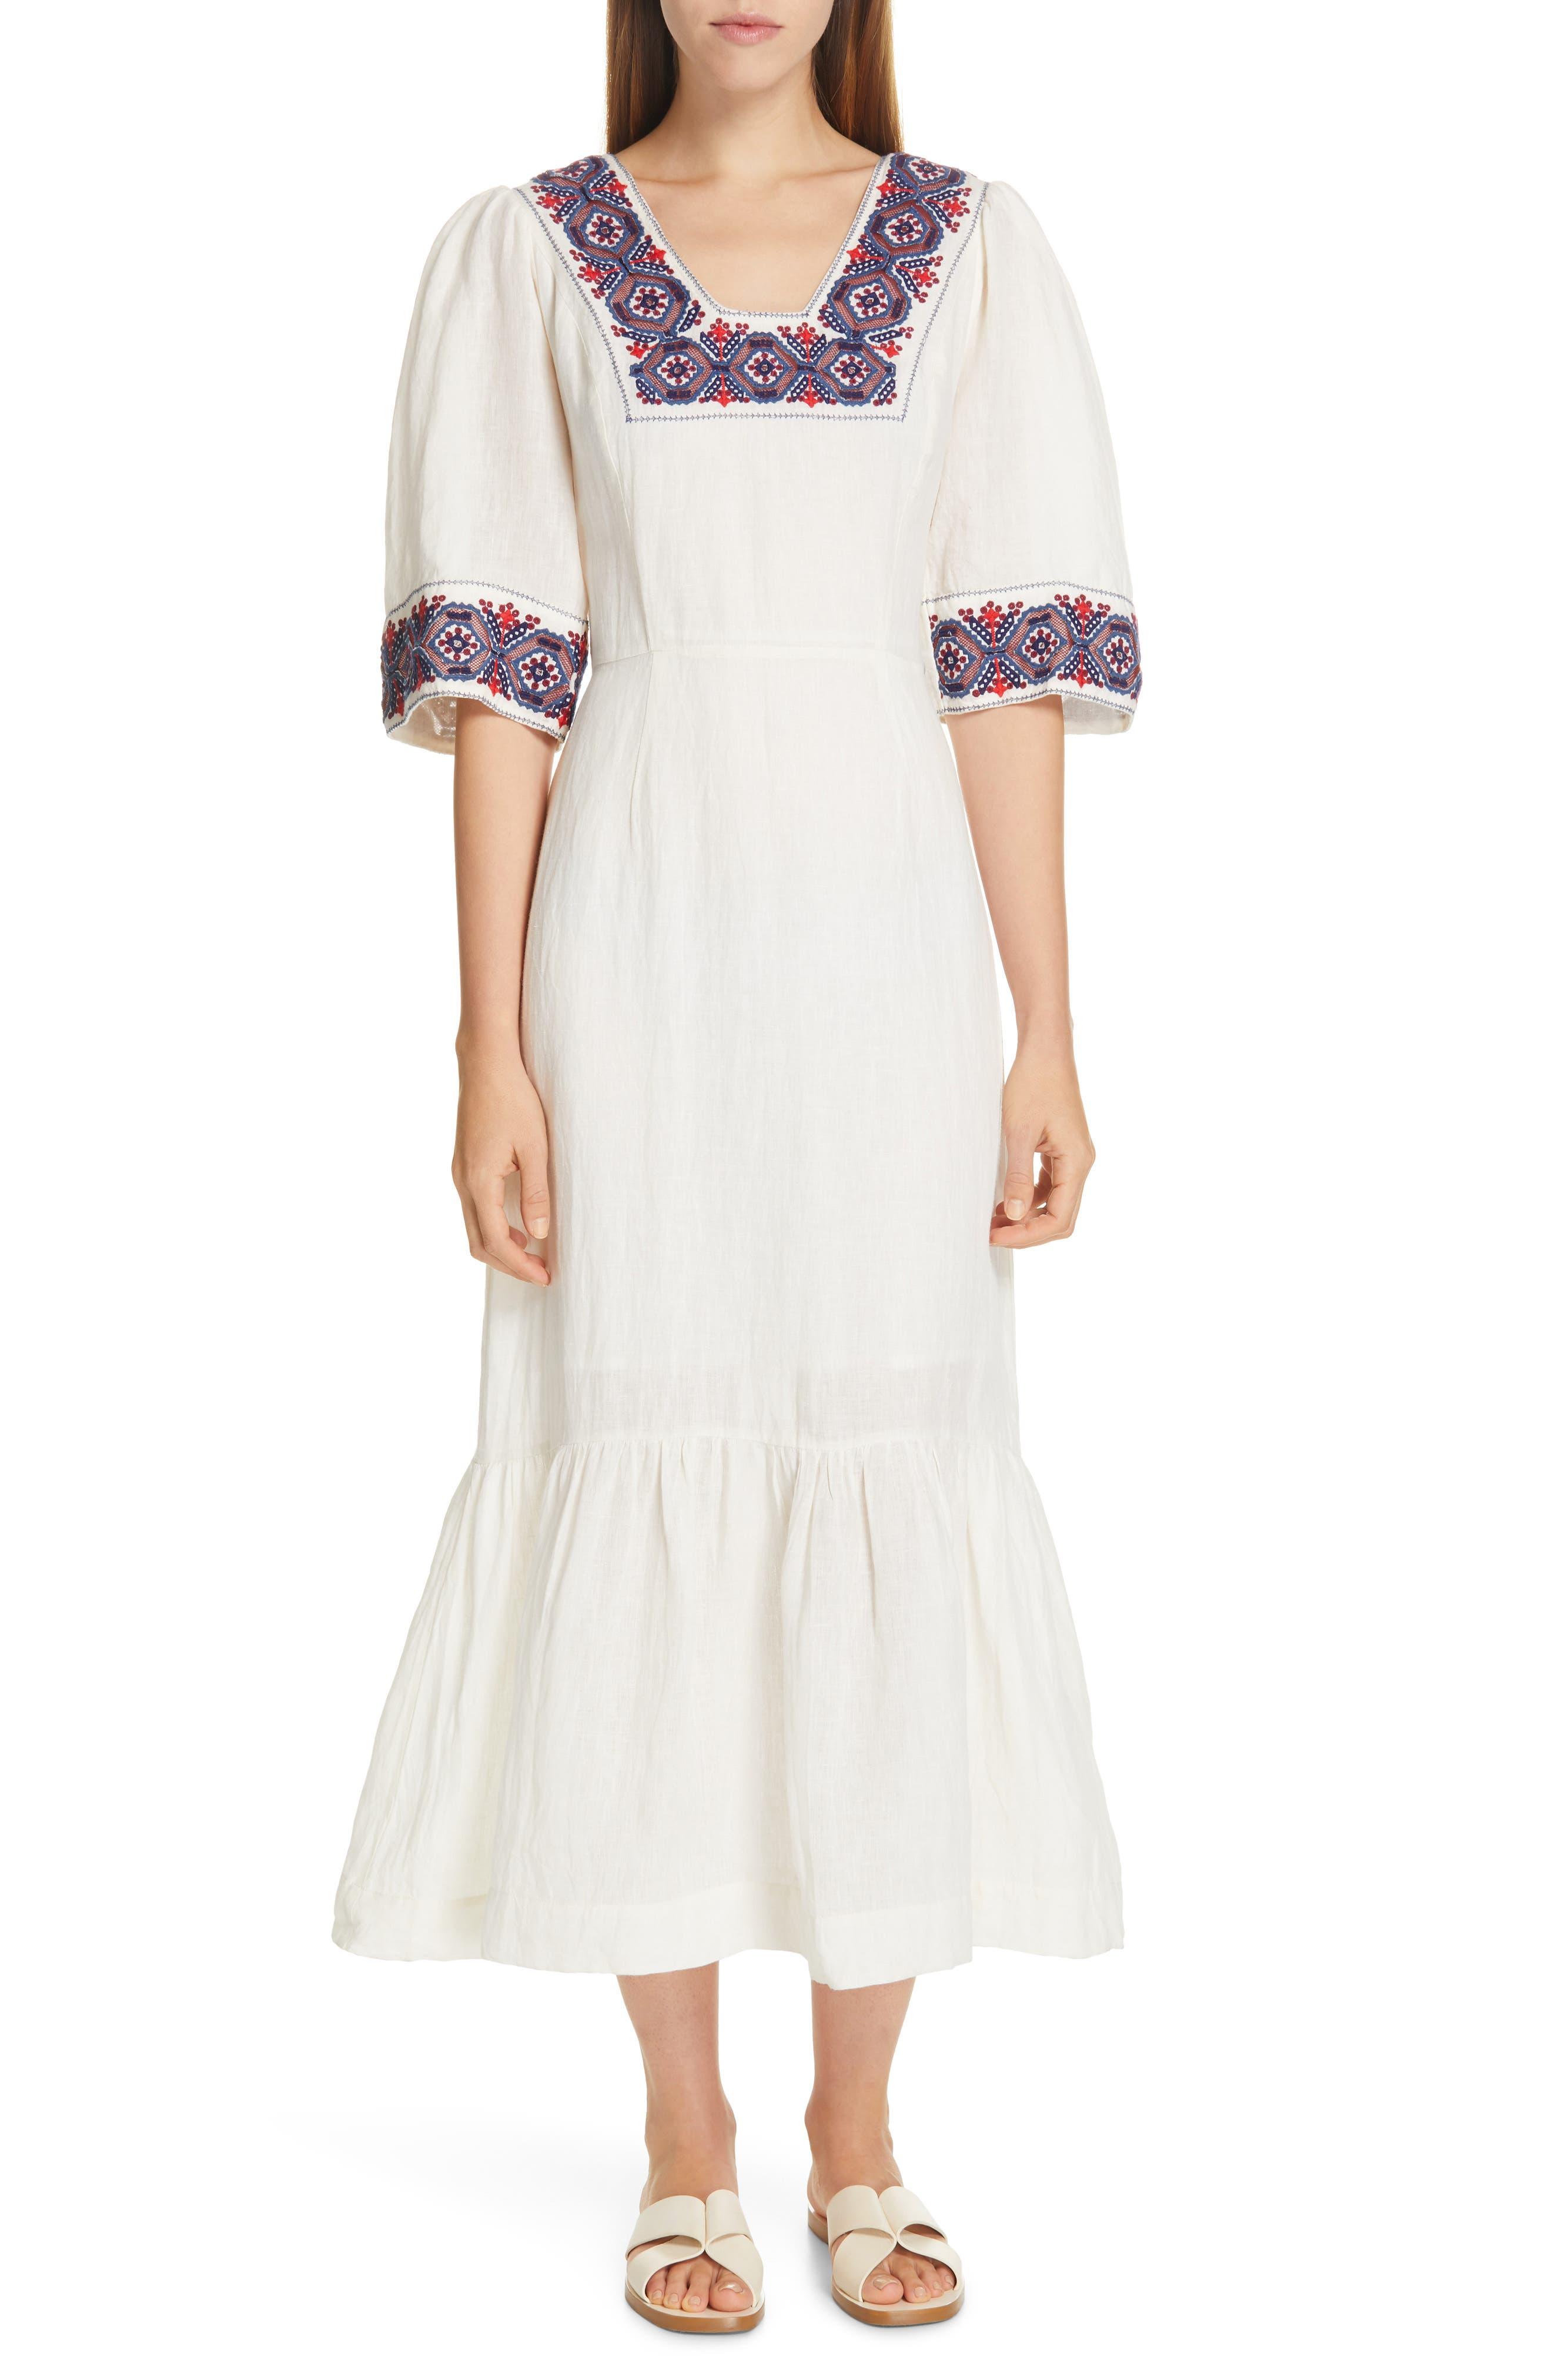 70s Dresses – Disco Dress, Hippie Dress, Wrap Dress Womens Sea Leah Embroidered Puff Sleeve Long Cotton Dress Size 12 - Ivory $284.98 AT vintagedancer.com